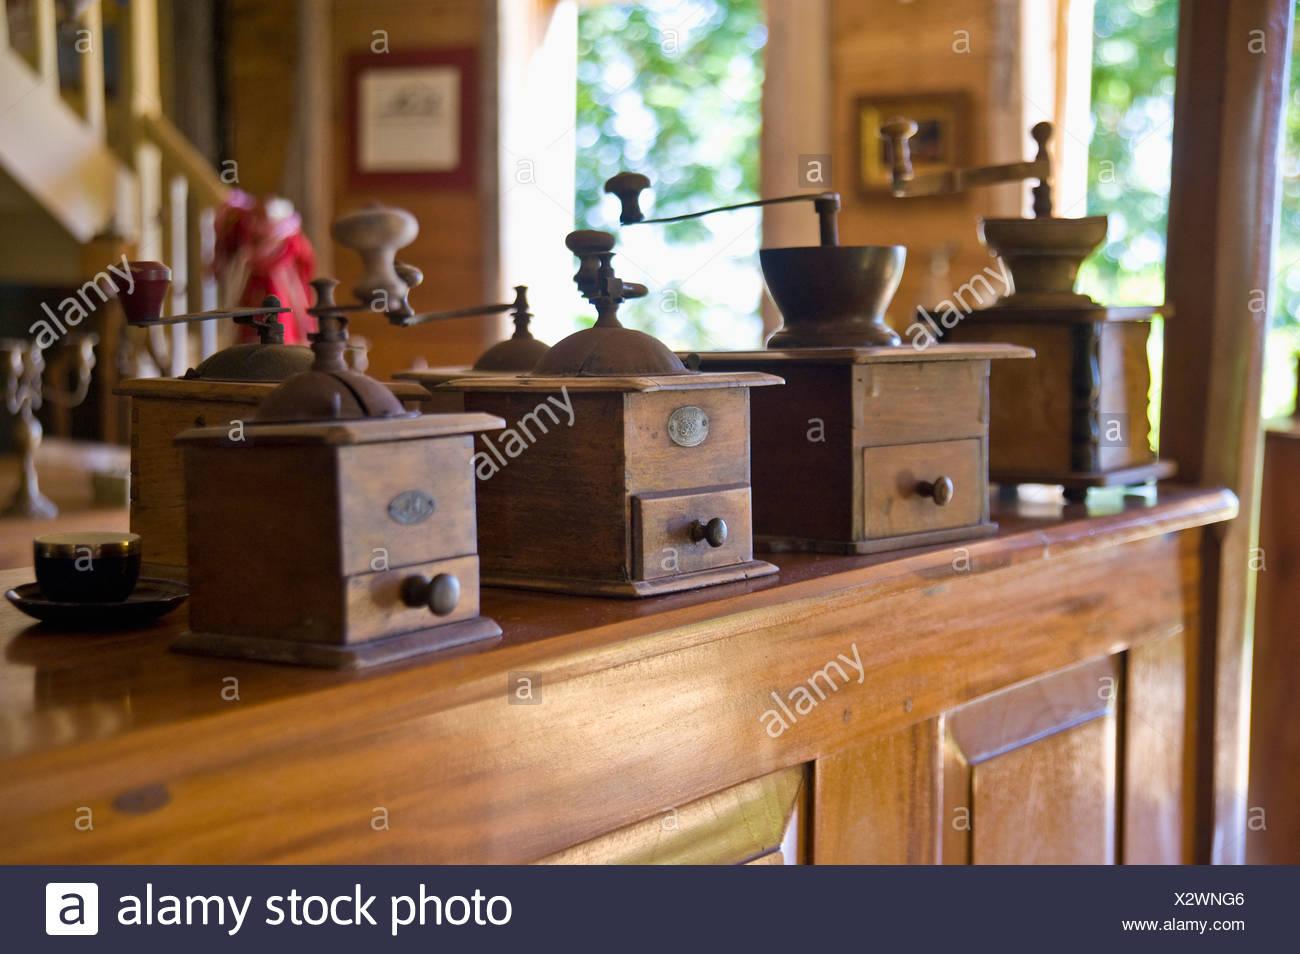 Coffee mills - Stock Image